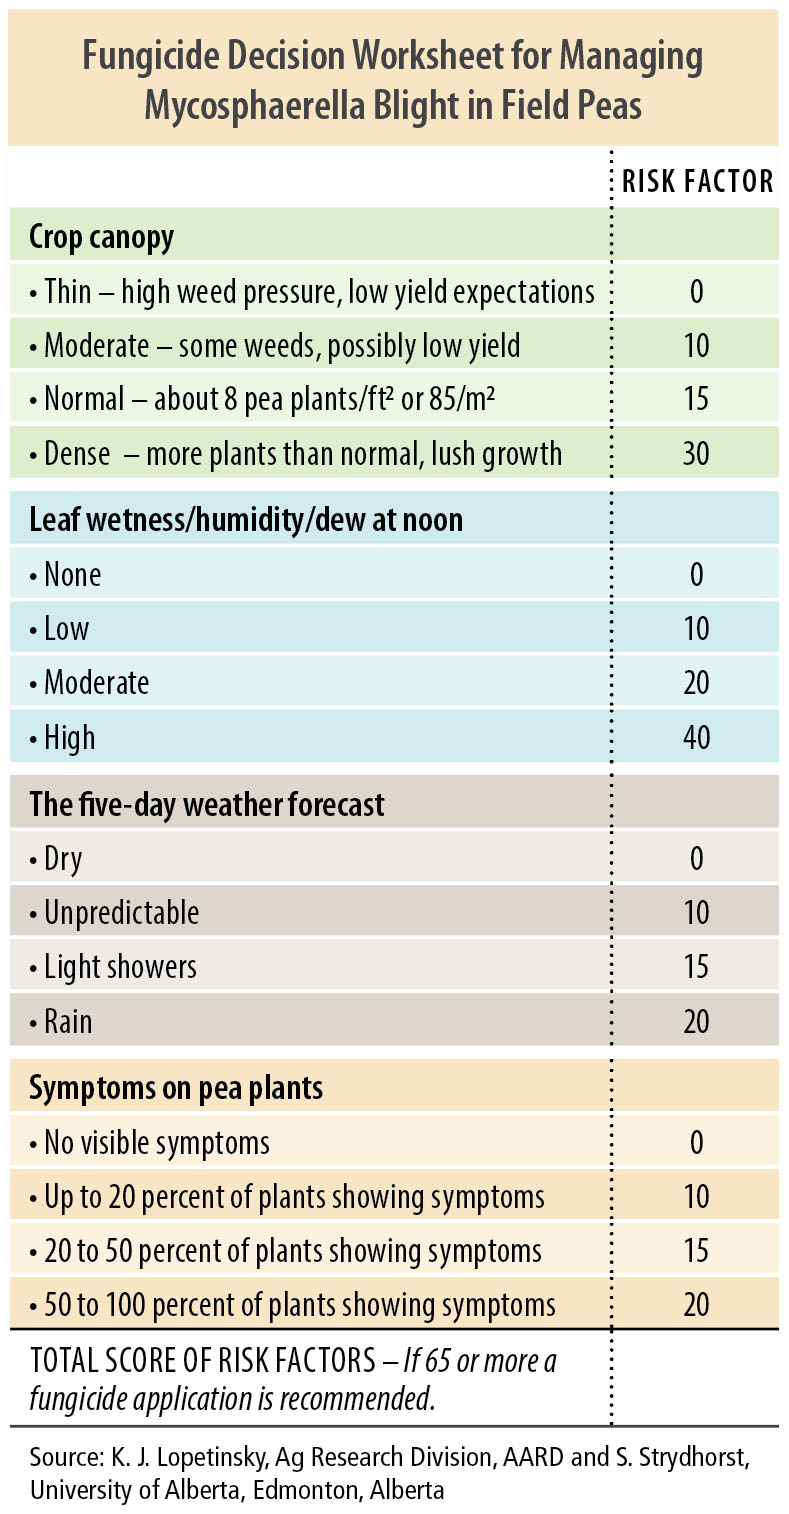 Managing Ascochyta (Mycosphaerella) Blight in Field Peas